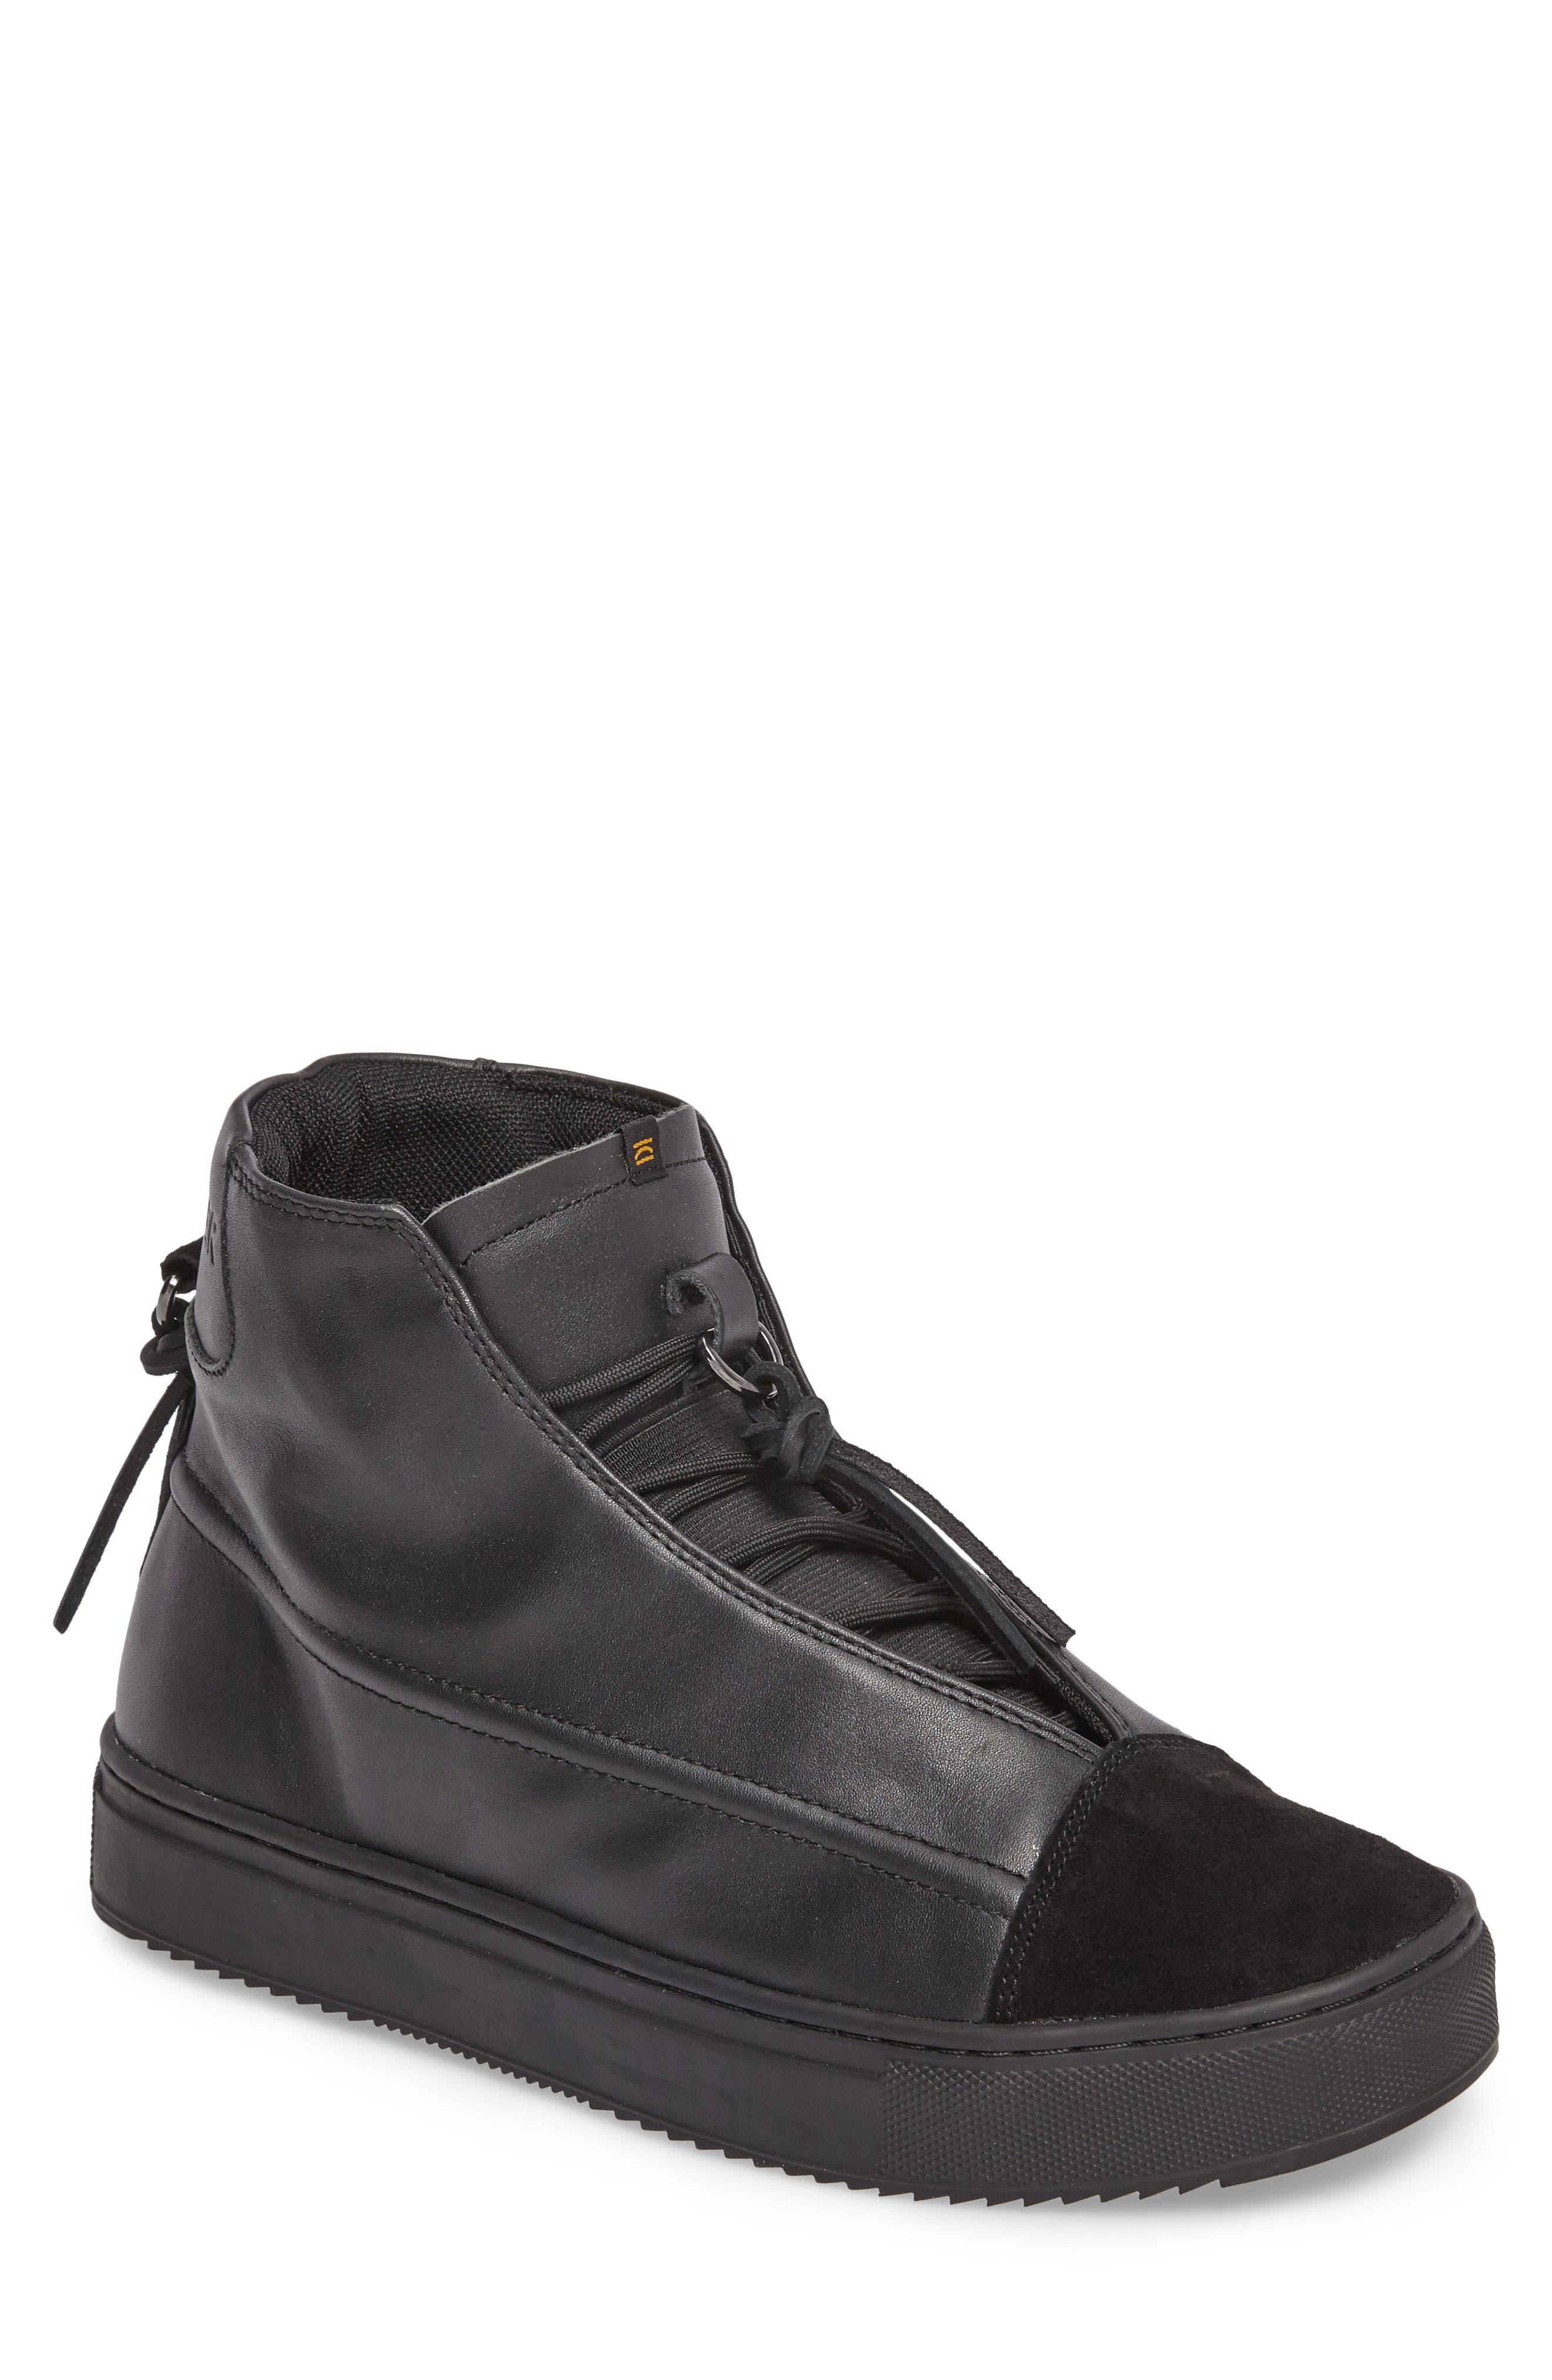 Sidney High Top Sneaker,                             Main thumbnail 1, color,                             Black